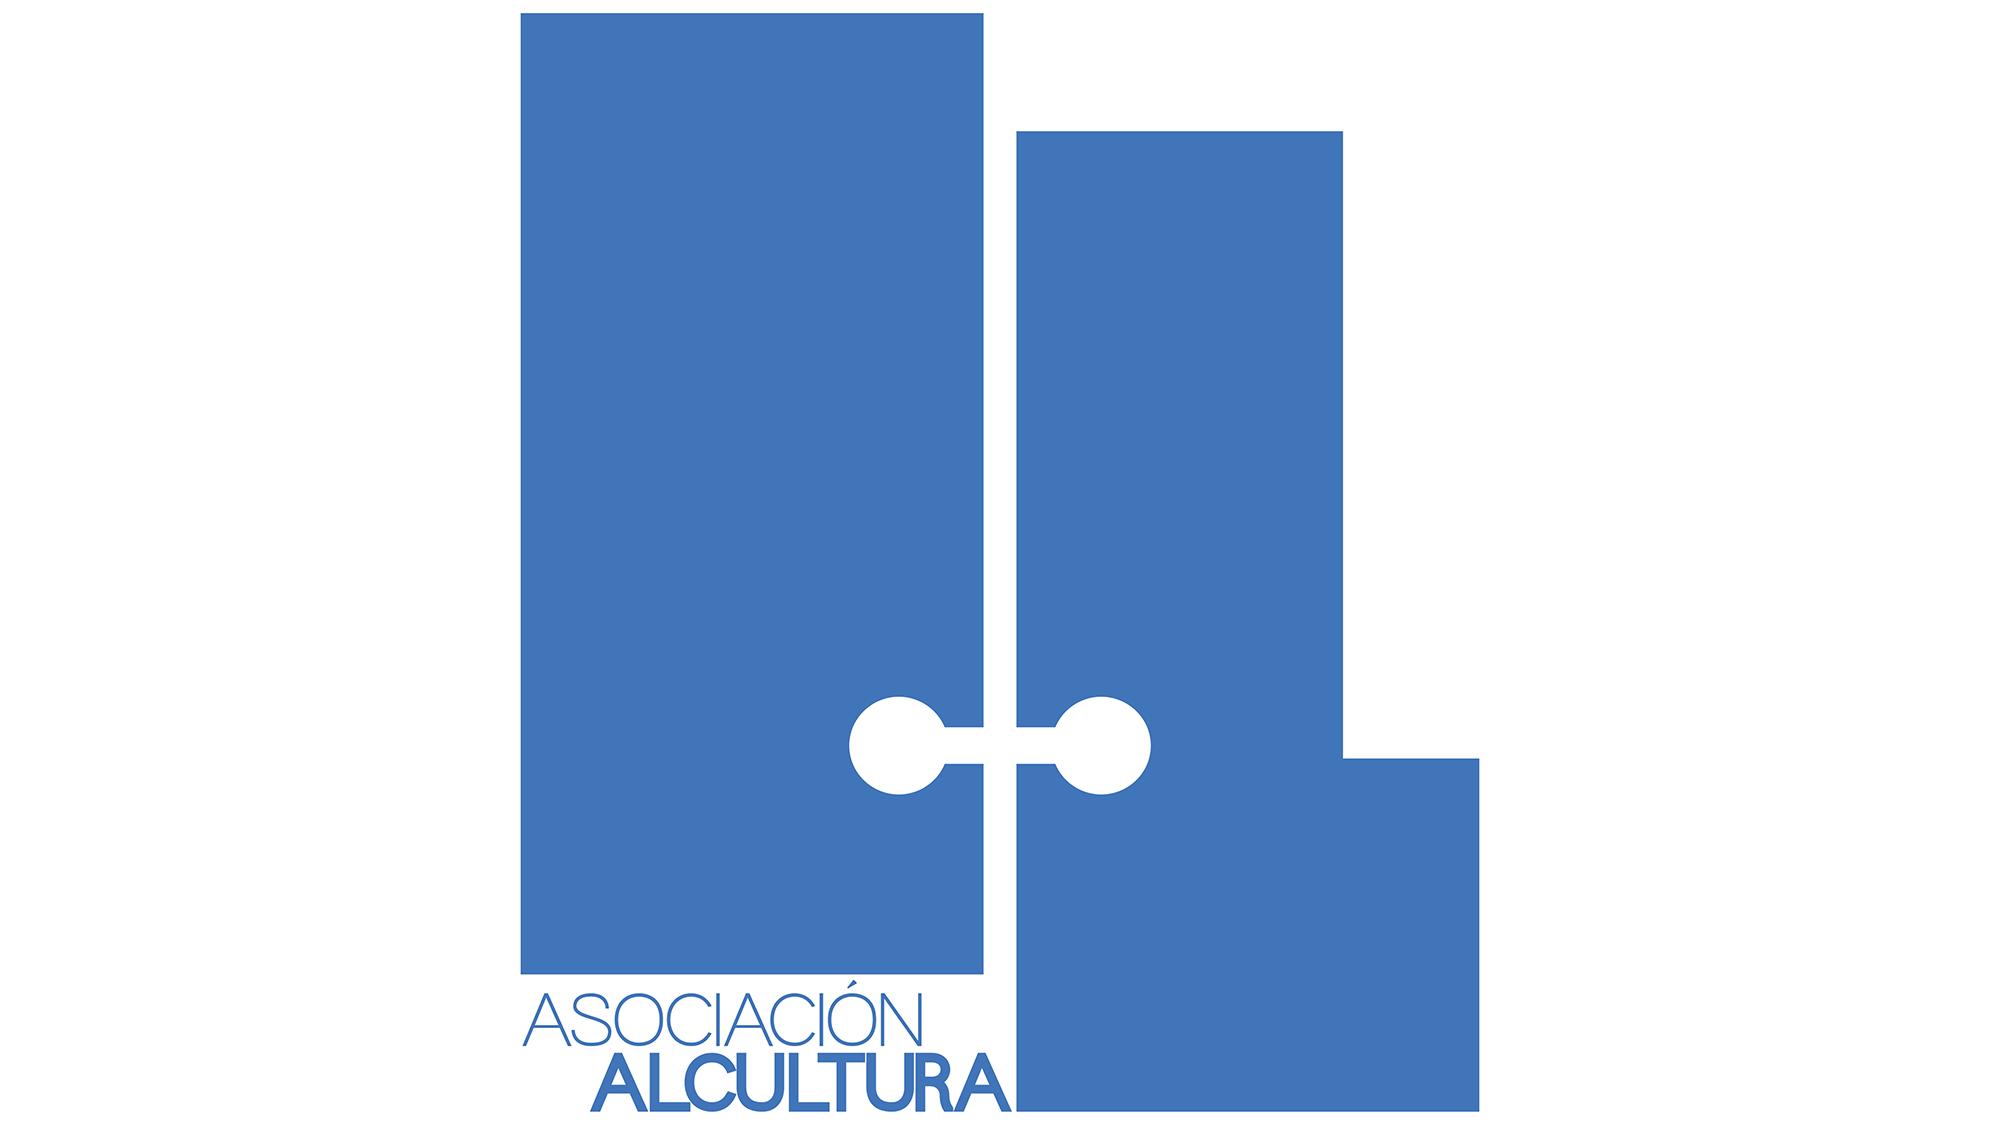 Logo de Asociación Alcultura de Algeciras